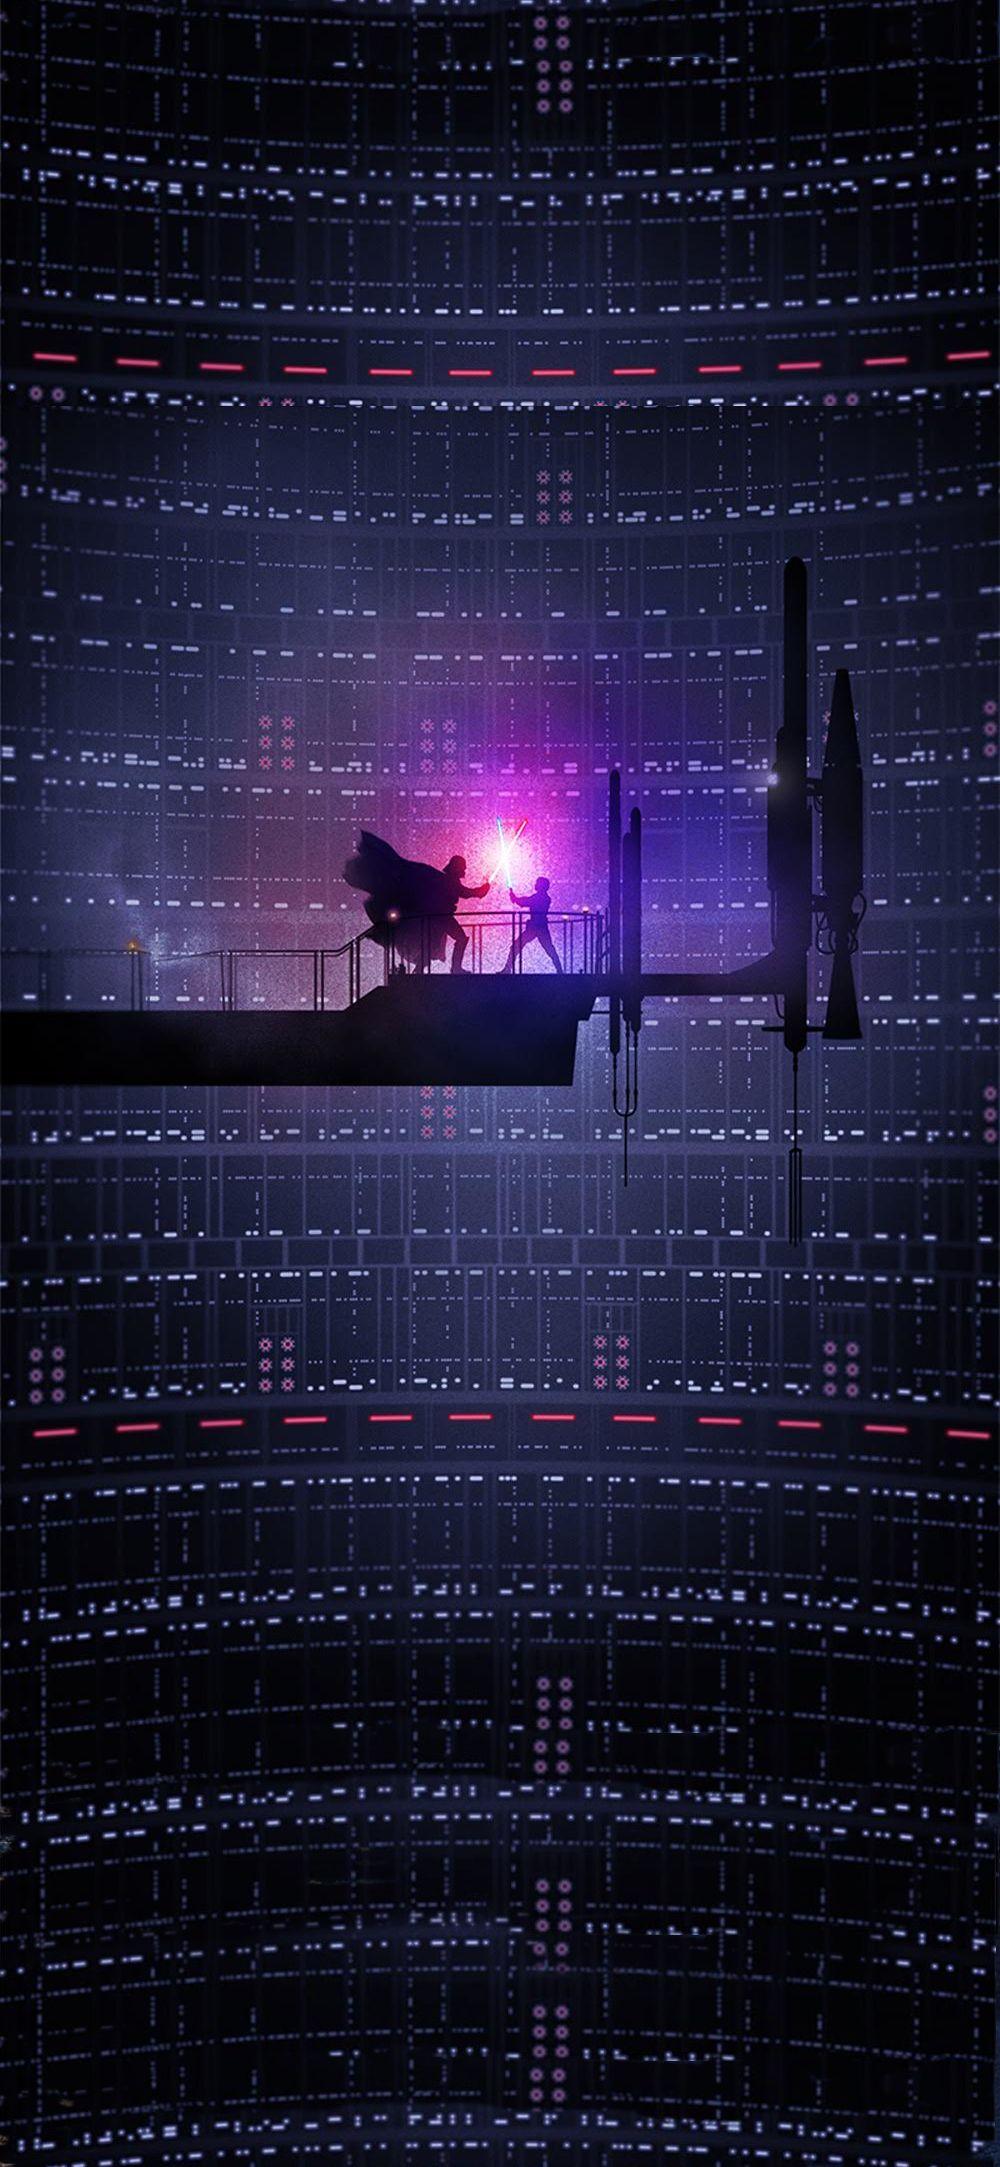 Star Wars Wallpaper Android Star Wars Wallpaper Star Wars Background Star Wars Wallpaper Iphone